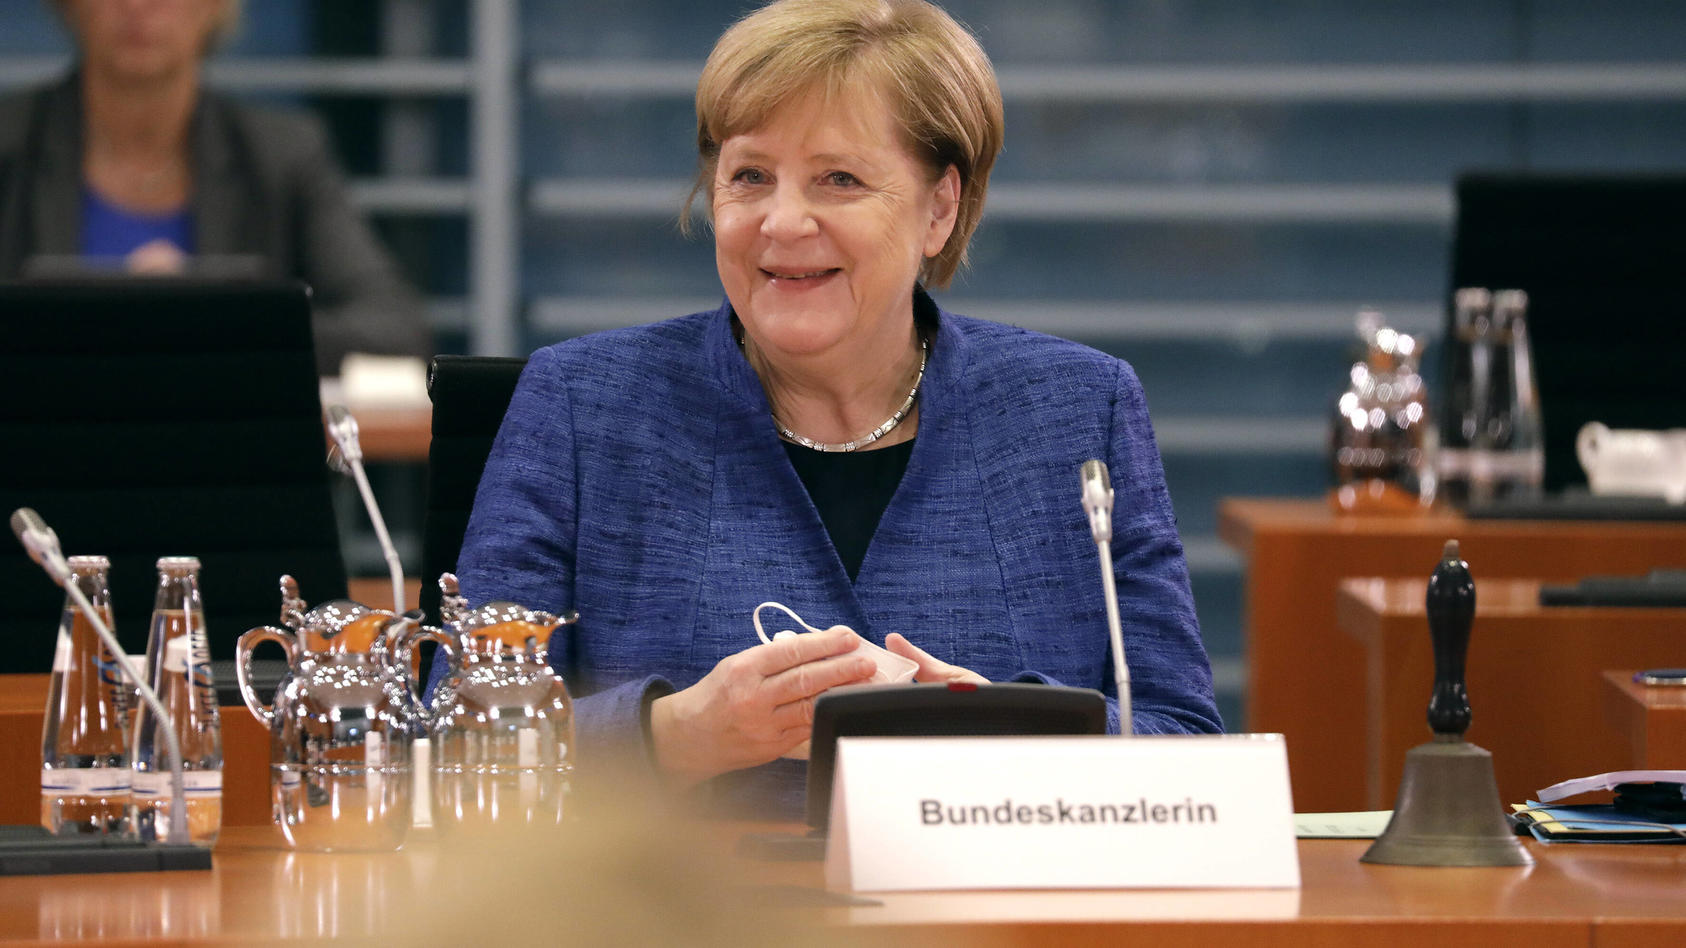 News Bilder des Tages Angela Merkel, Bundeskanzlerin, CDU, Bundeskabinett, DEU, Berlin, 21.10.2020 *** Angela Merkel, Fe